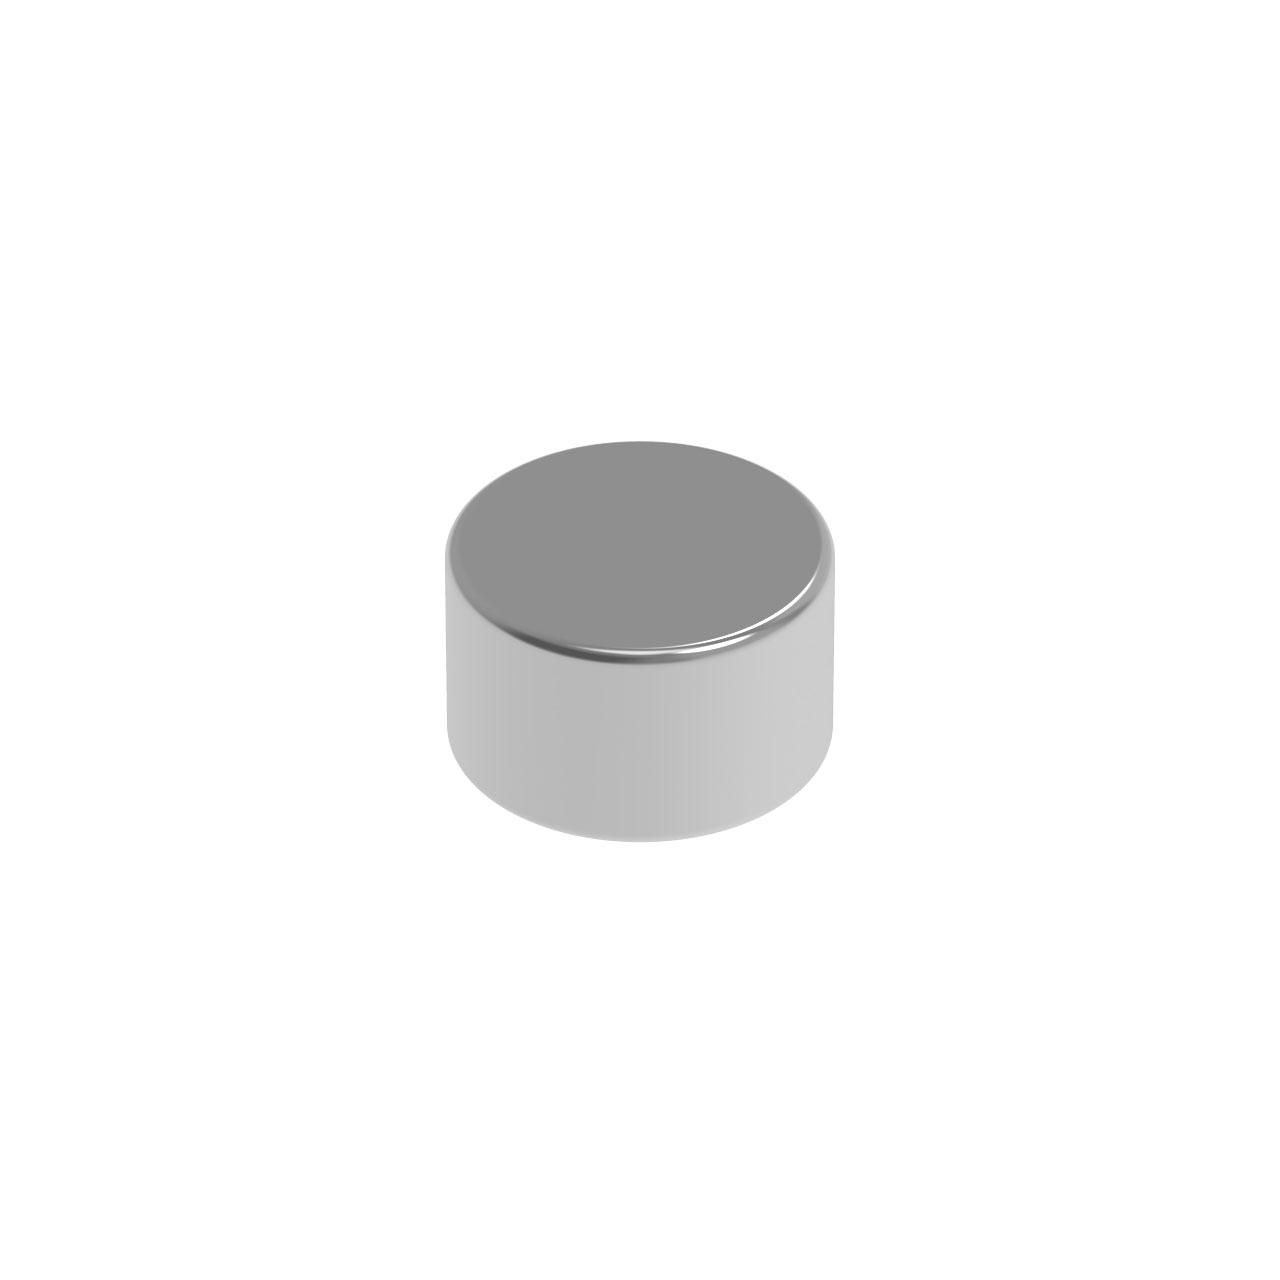 HIQPARTS(ハイキューパーツ) ネオジム磁石 N52 丸形 直径2.5mm x 高さ1.5mm(10個入) [MGN2515] 4582370700637